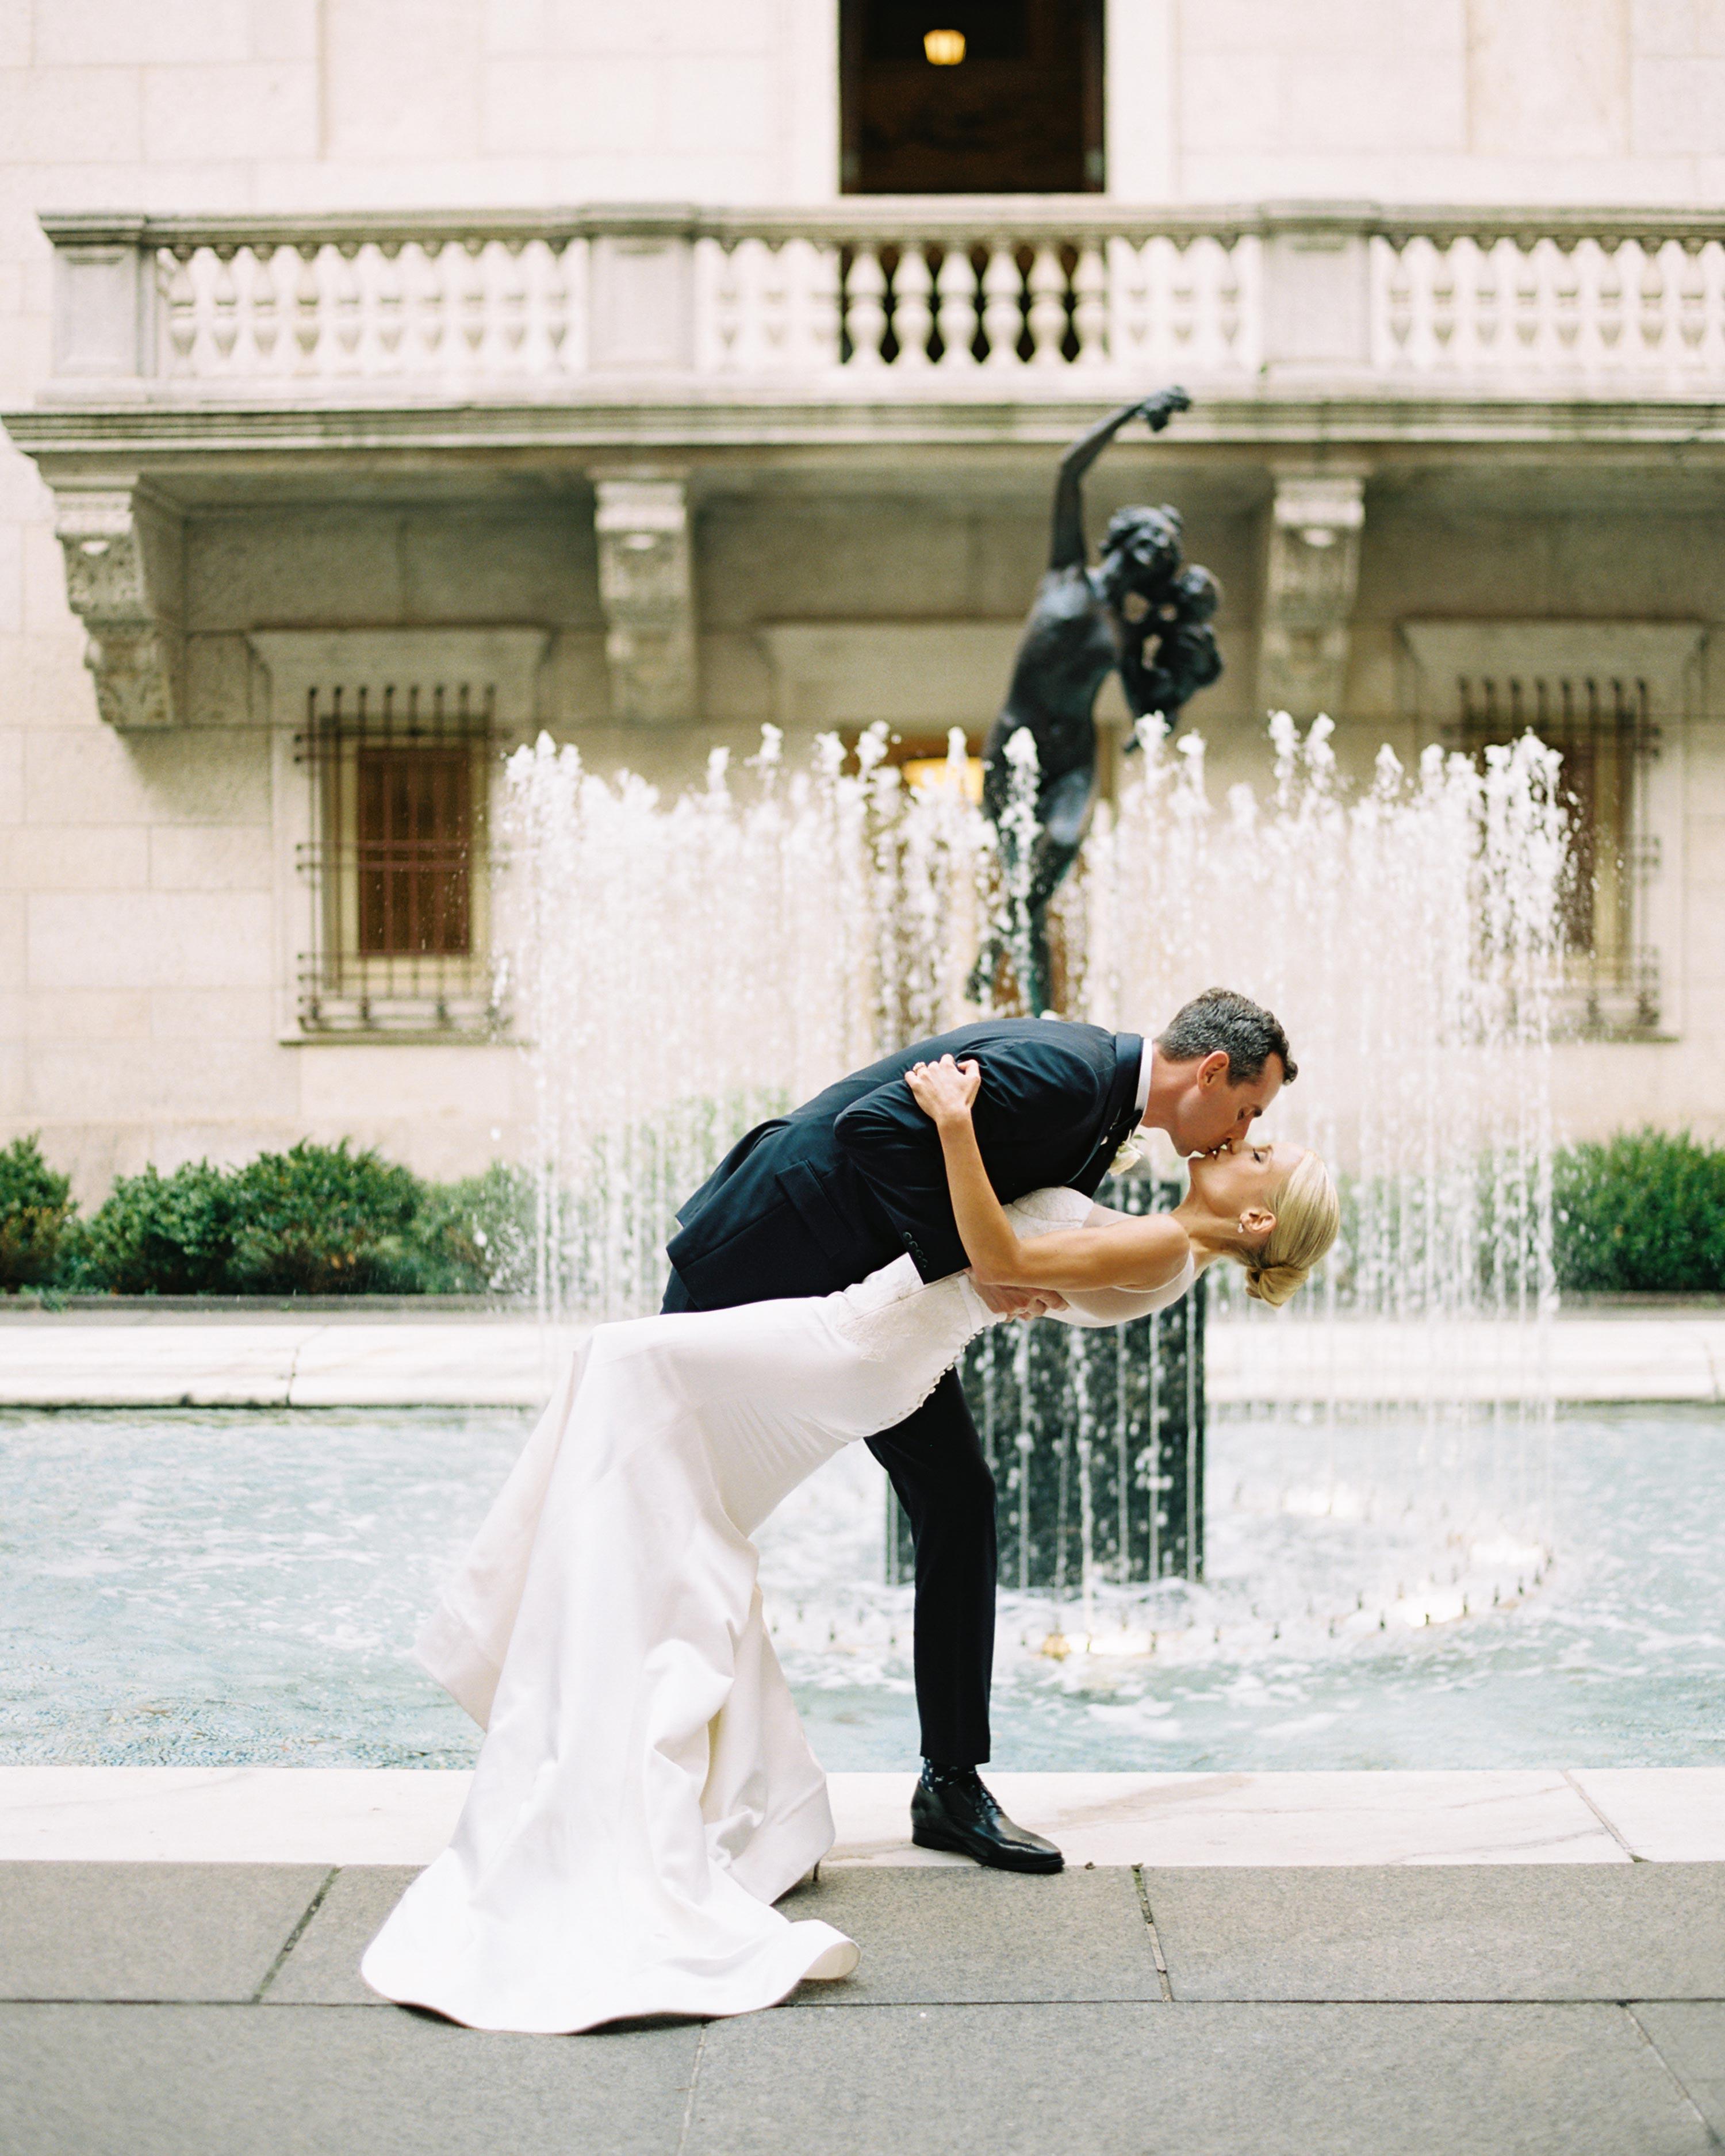 katie-kent-wedding-couple-343-s112765-0316.jpg